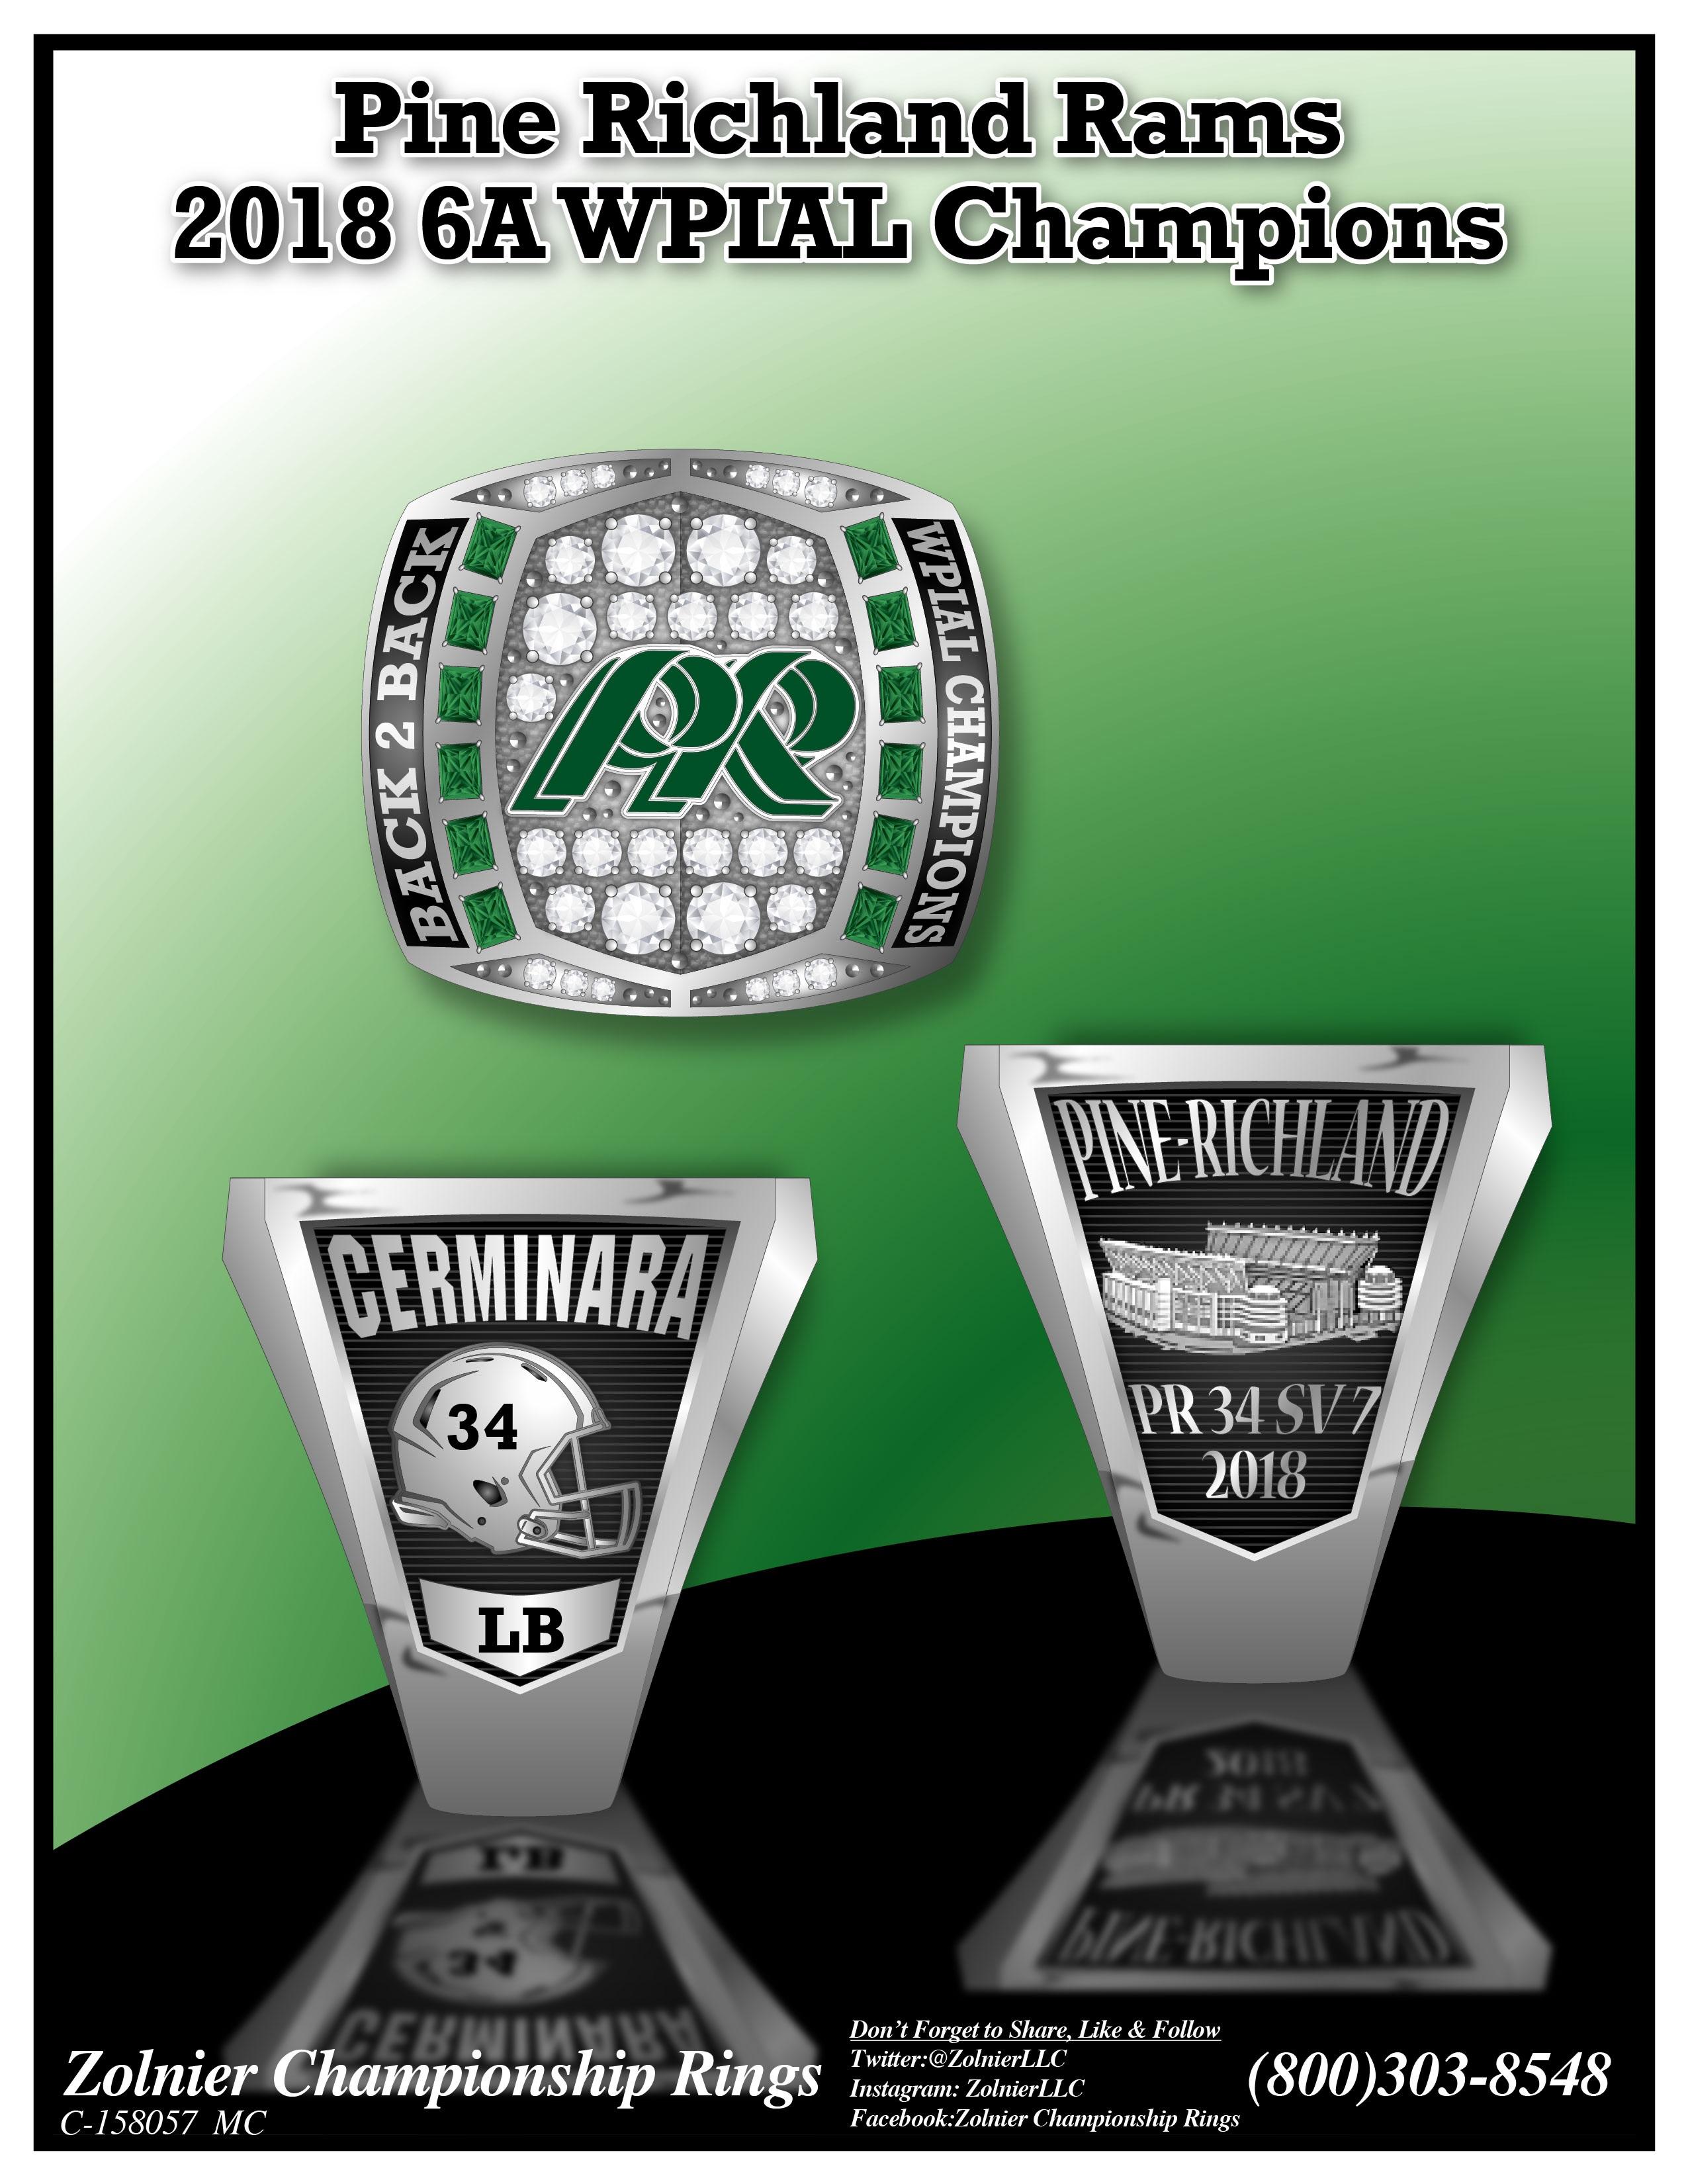 C-158057 Pine Richland Football Champ Ring